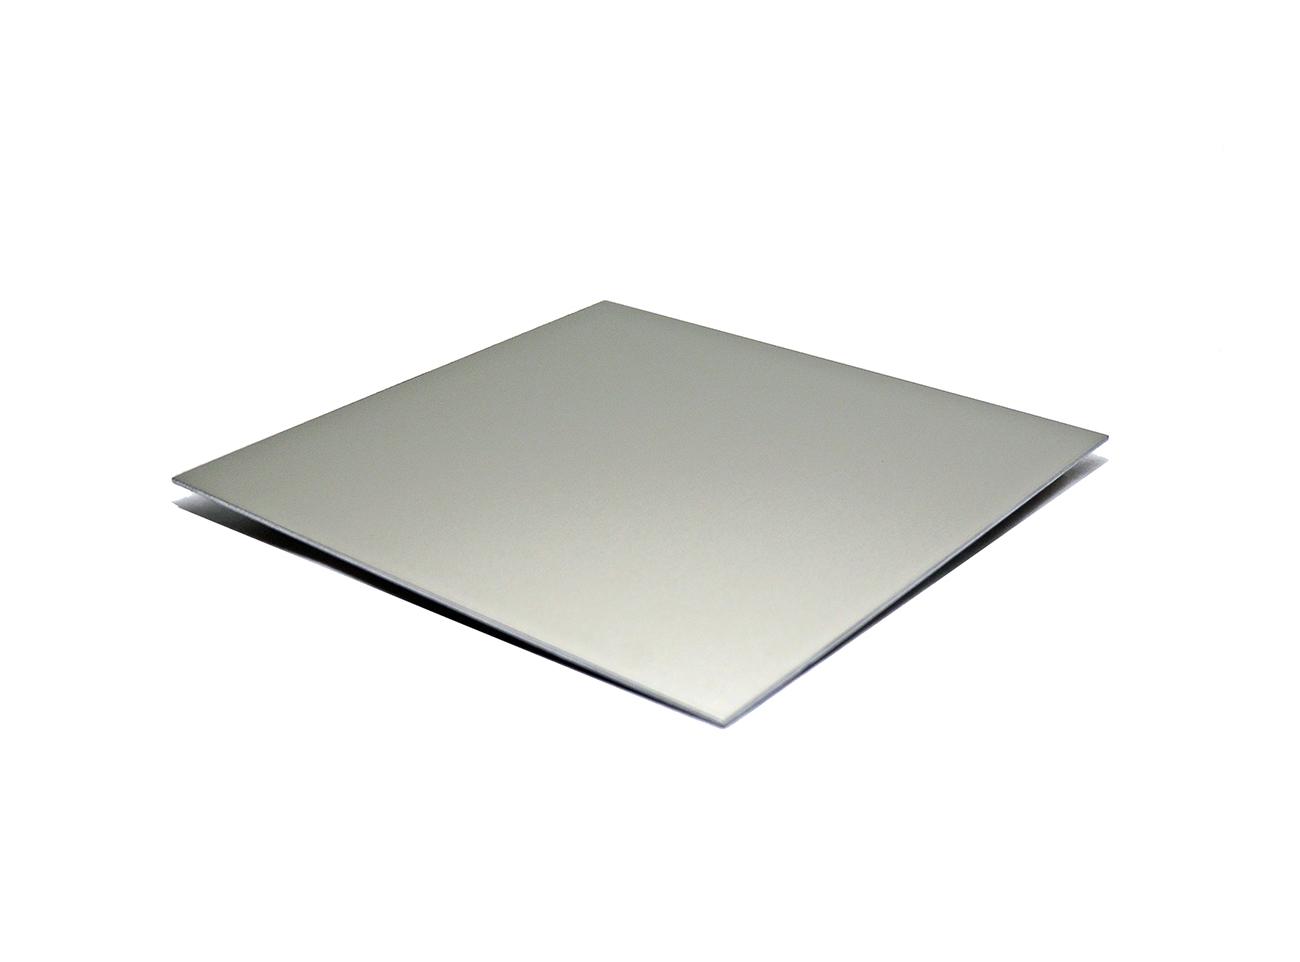 Aluminio Inox